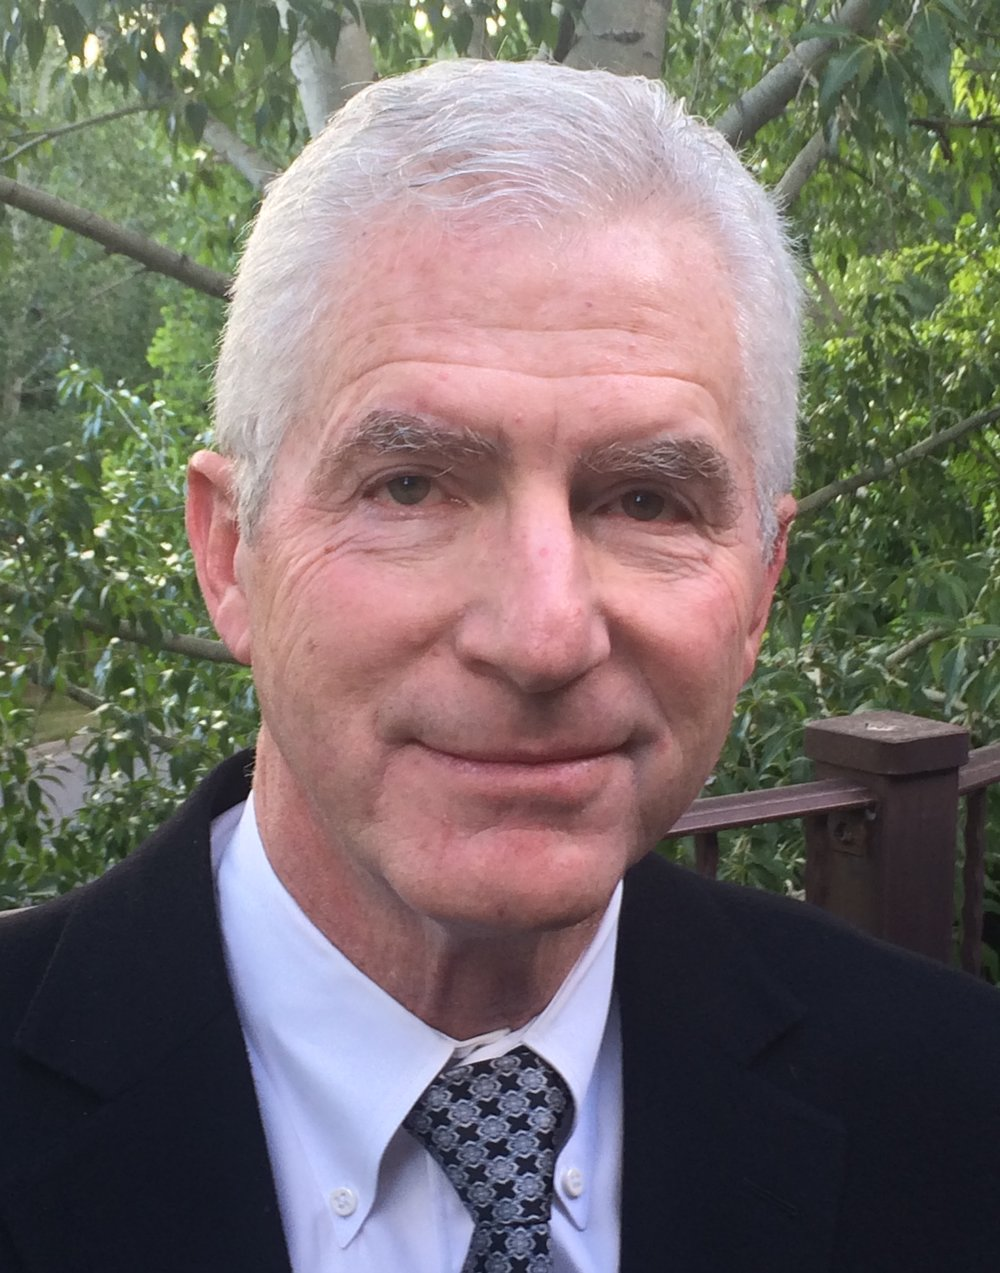 Albert Slap - Coastal Risk Consulting,president and co-founder